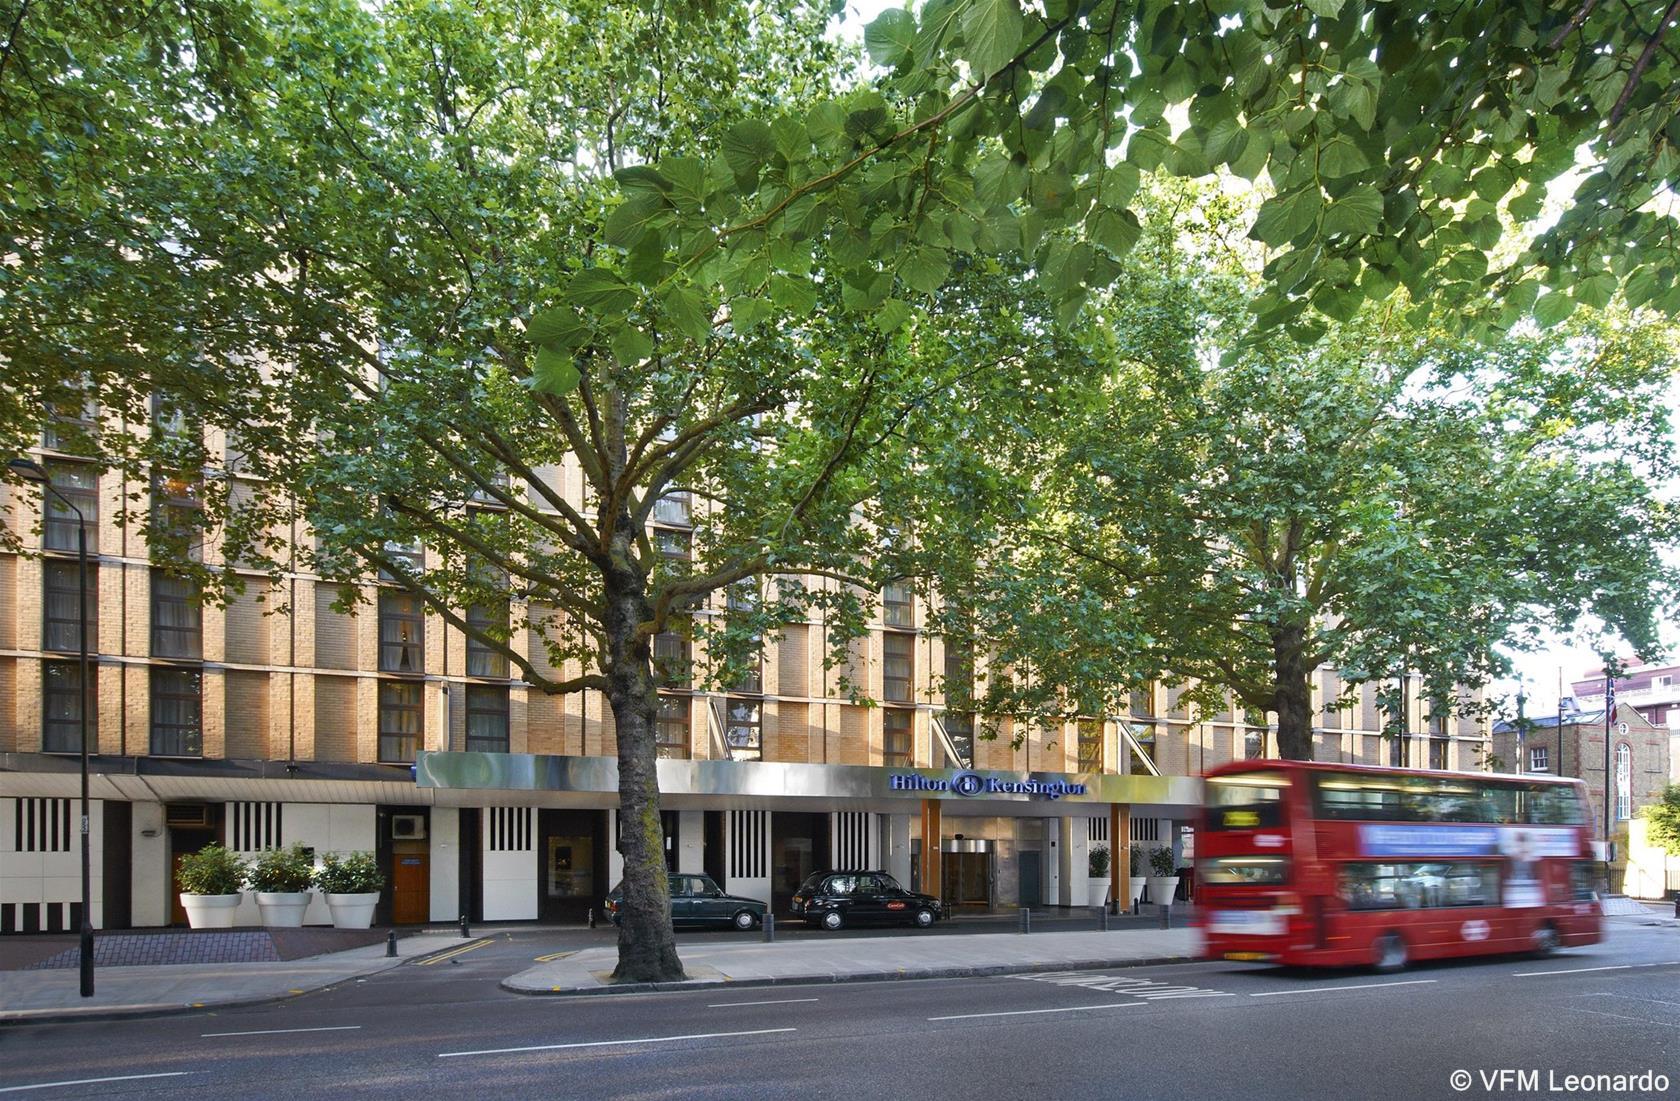 Inghilterra londra e cornovaglia tour classico for Somerset hotel londra